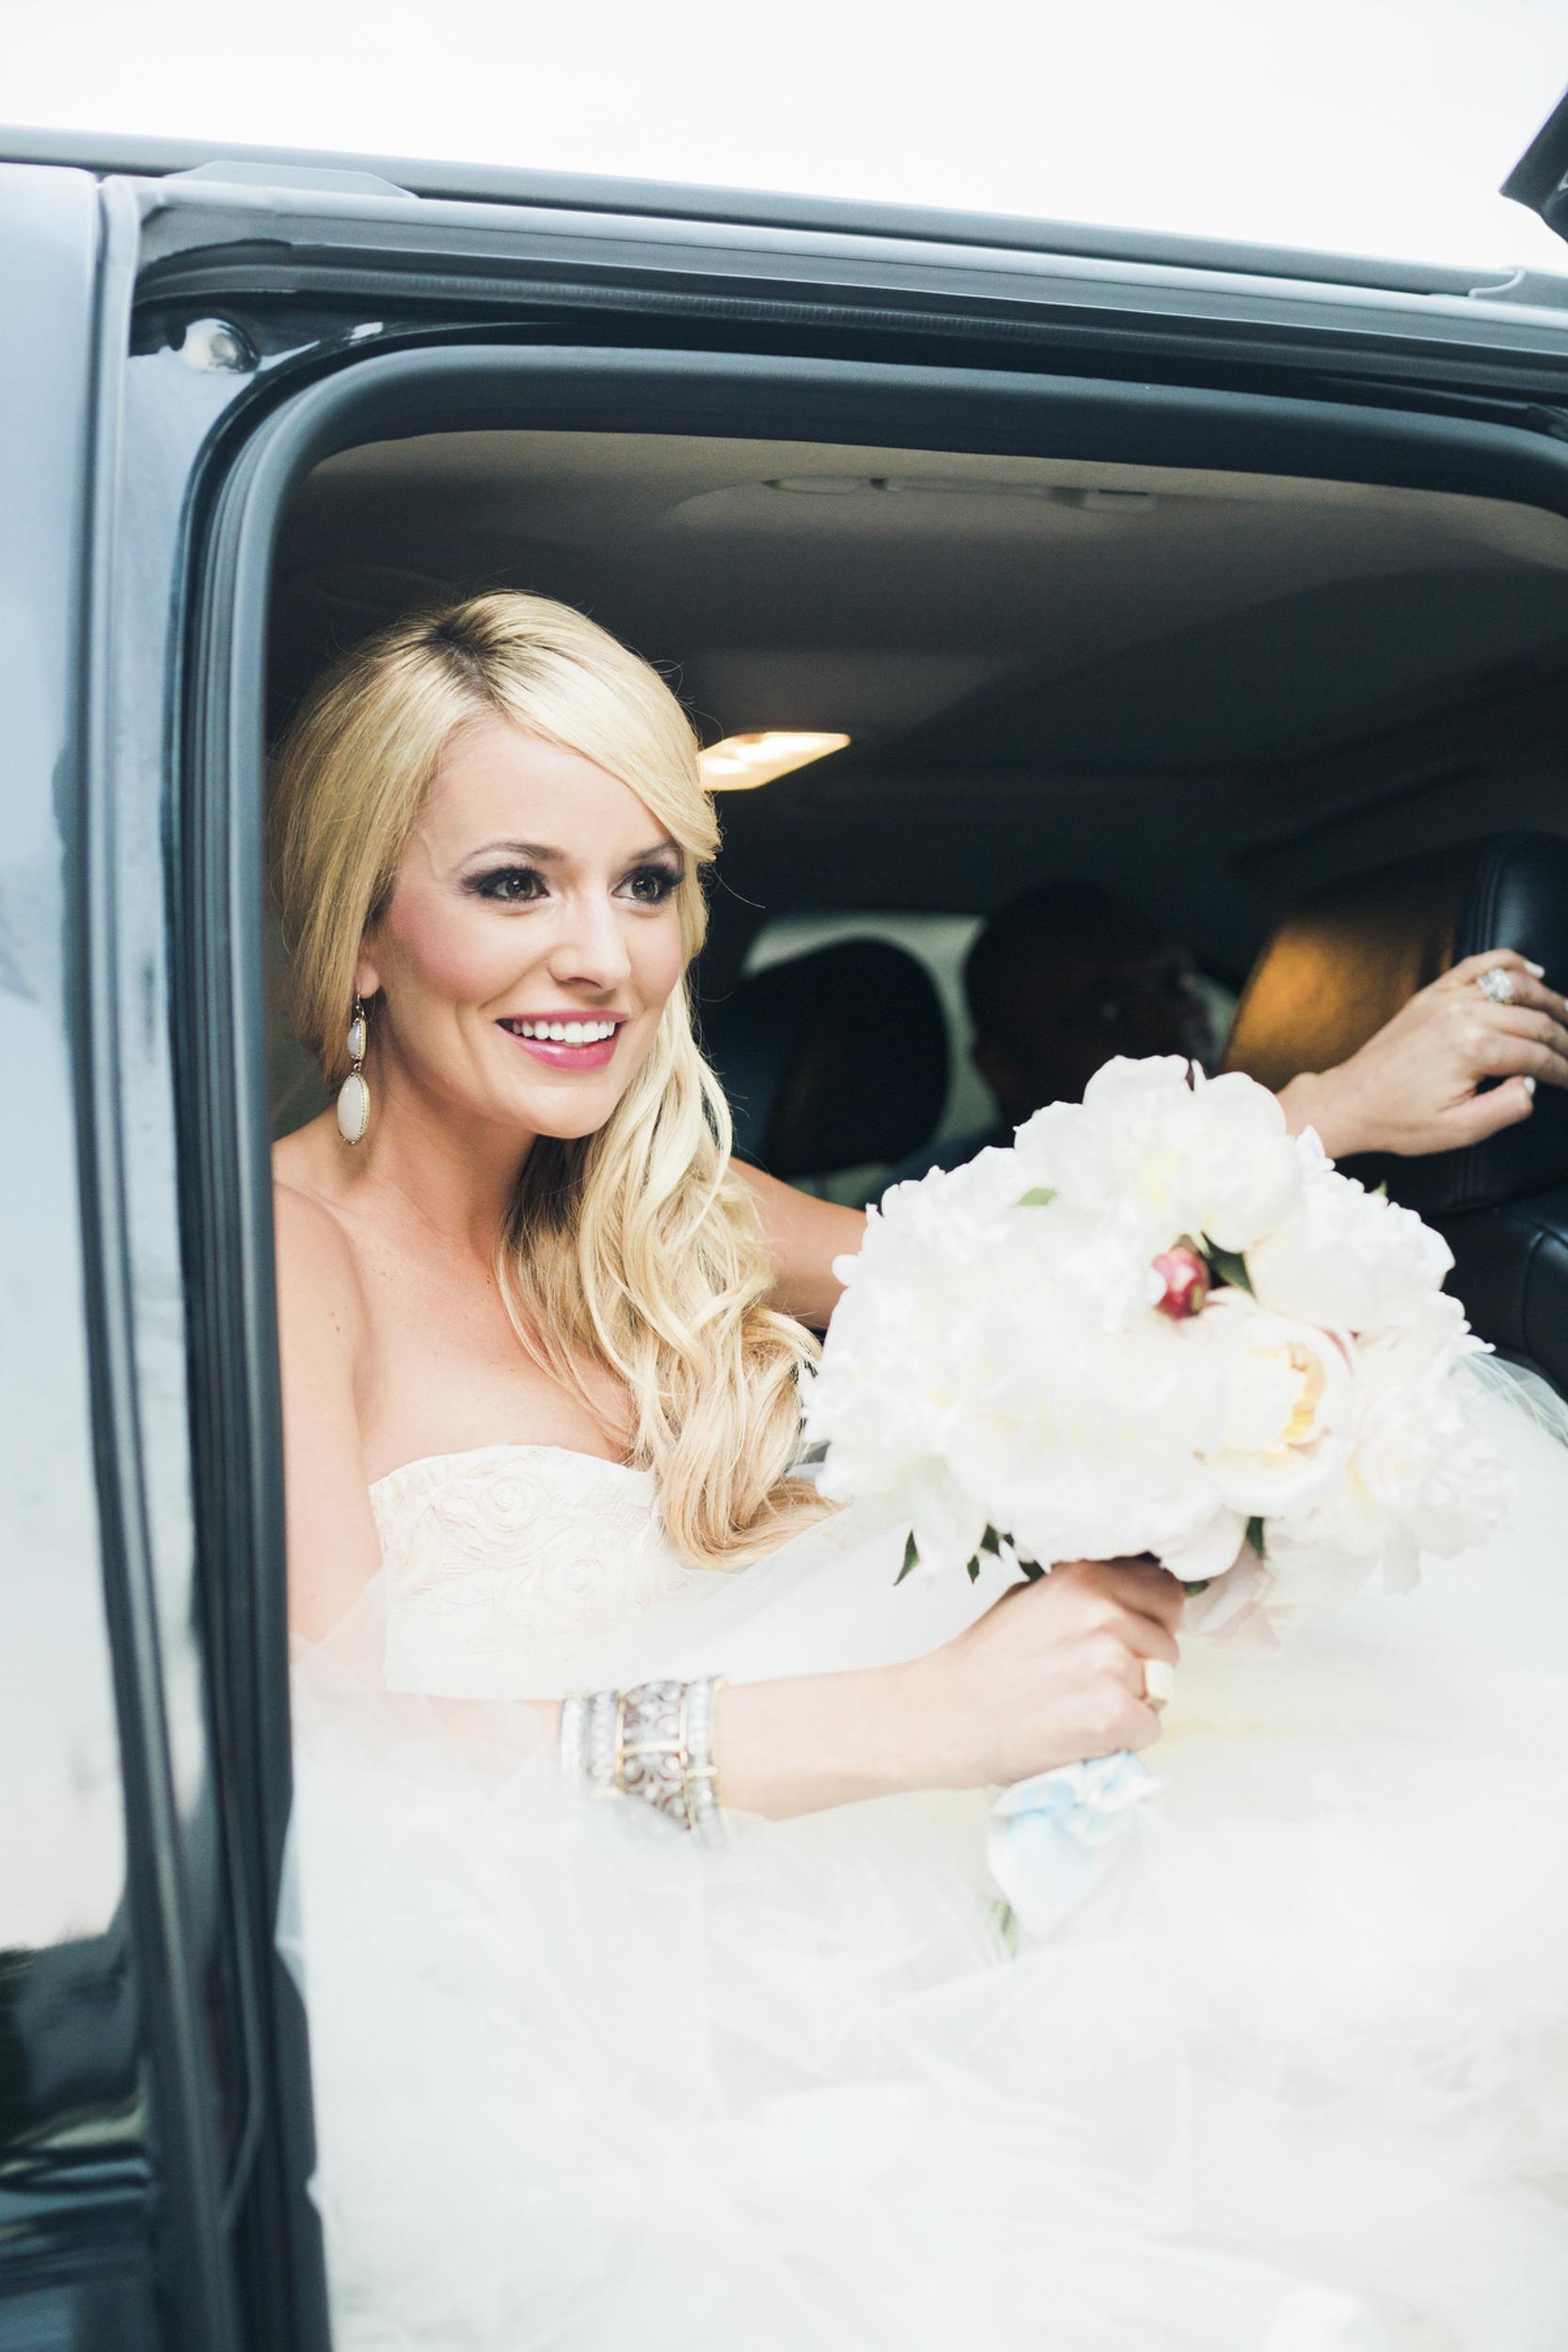 south_carolina_farm_wedding_rustic_chic_surprise_secret_luxe_wedding_bachelorette_emily_maynard_real_weddings-26.jpg